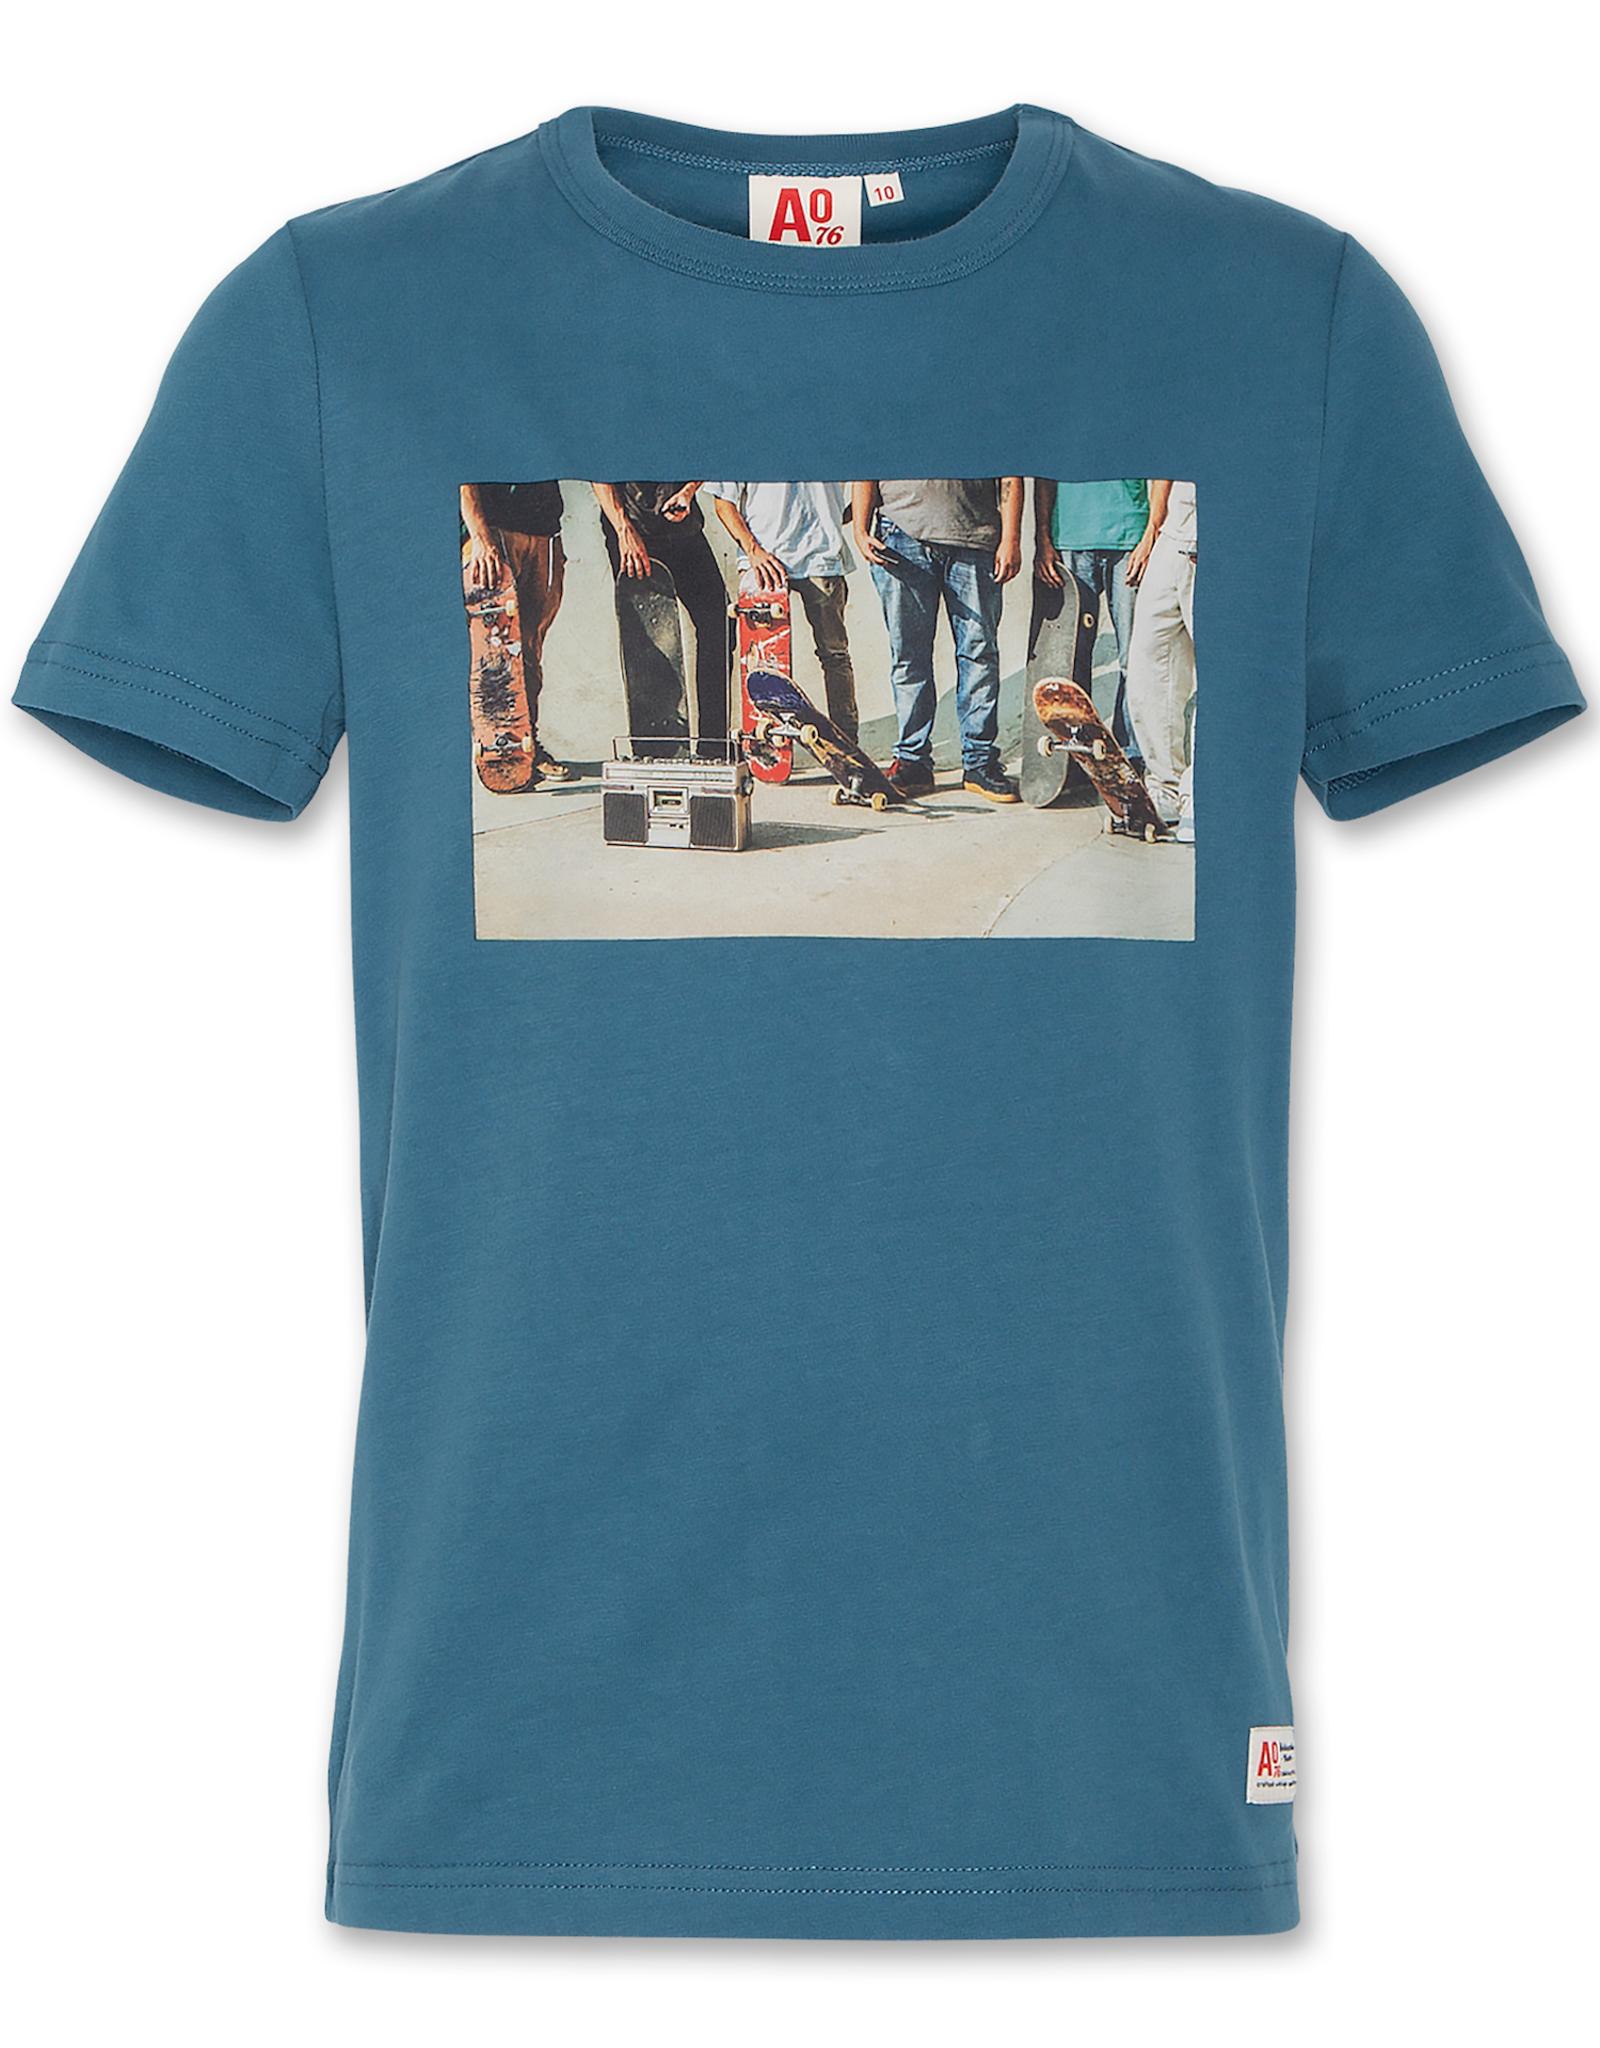 American Outfitters AO t-shirt skate laguna